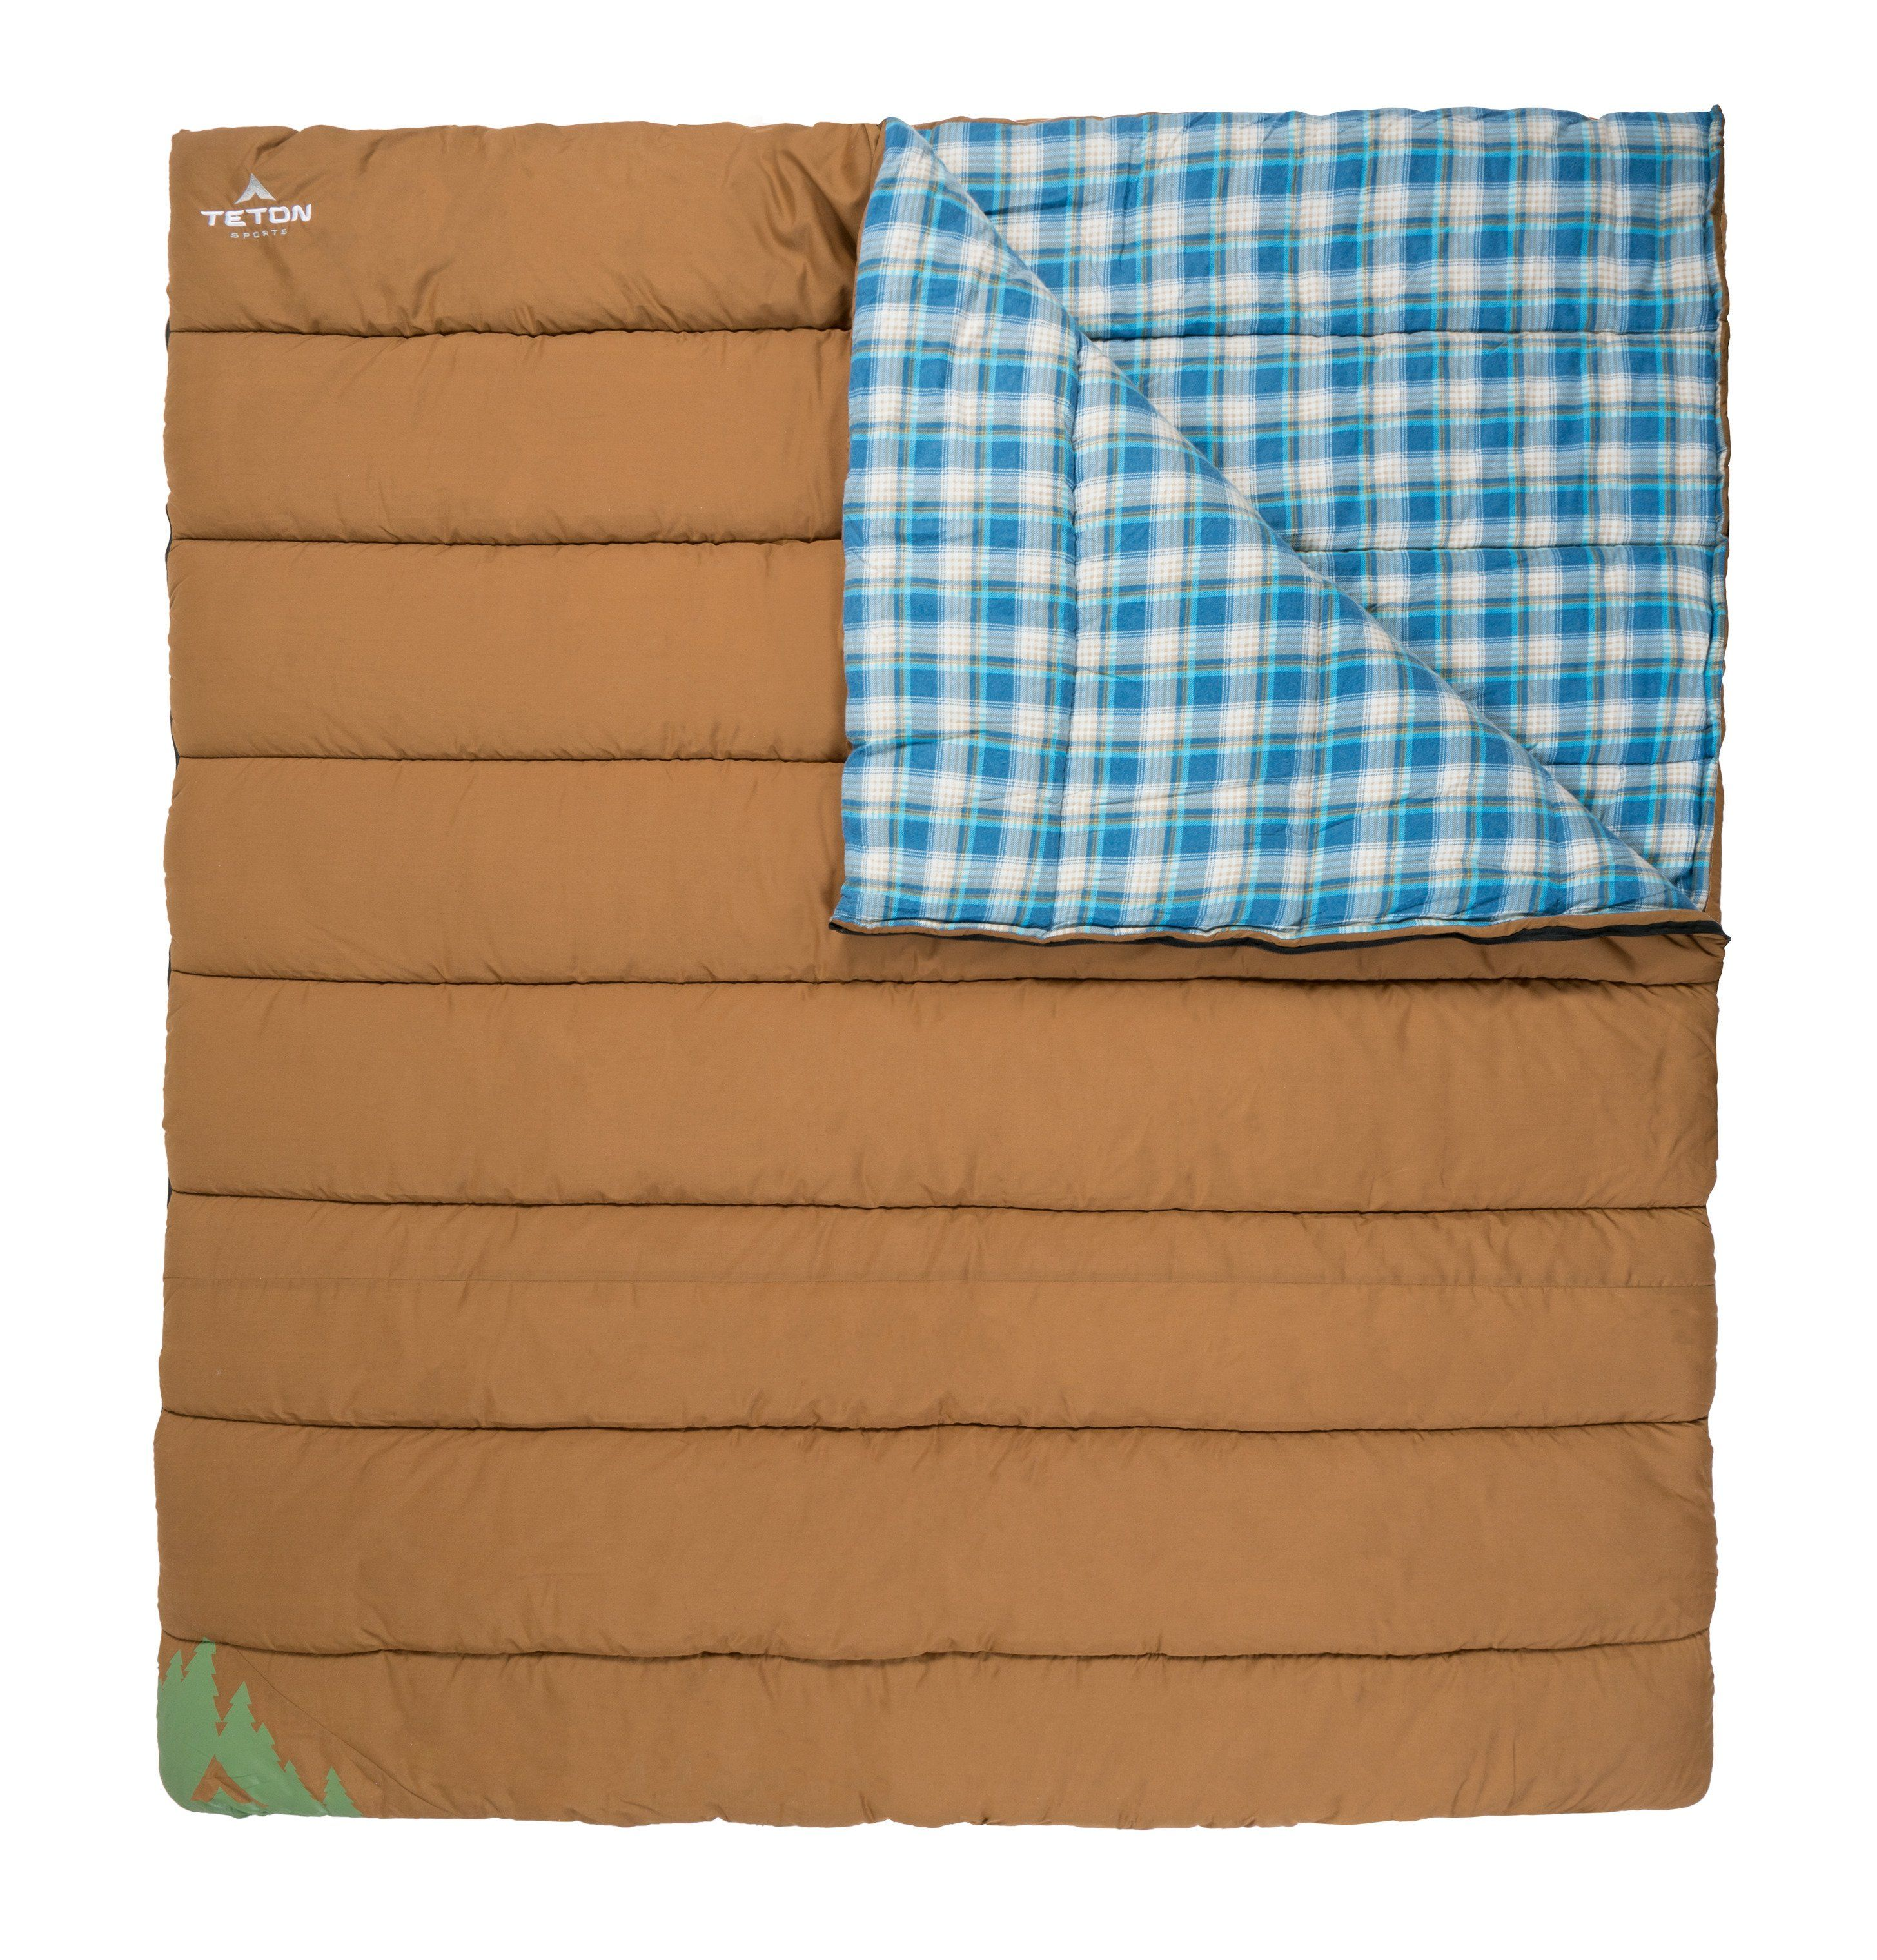 Evergreen Double Sleeping Bag Teton Sports Double Sleeping Bag Sleeping Bag Tetons